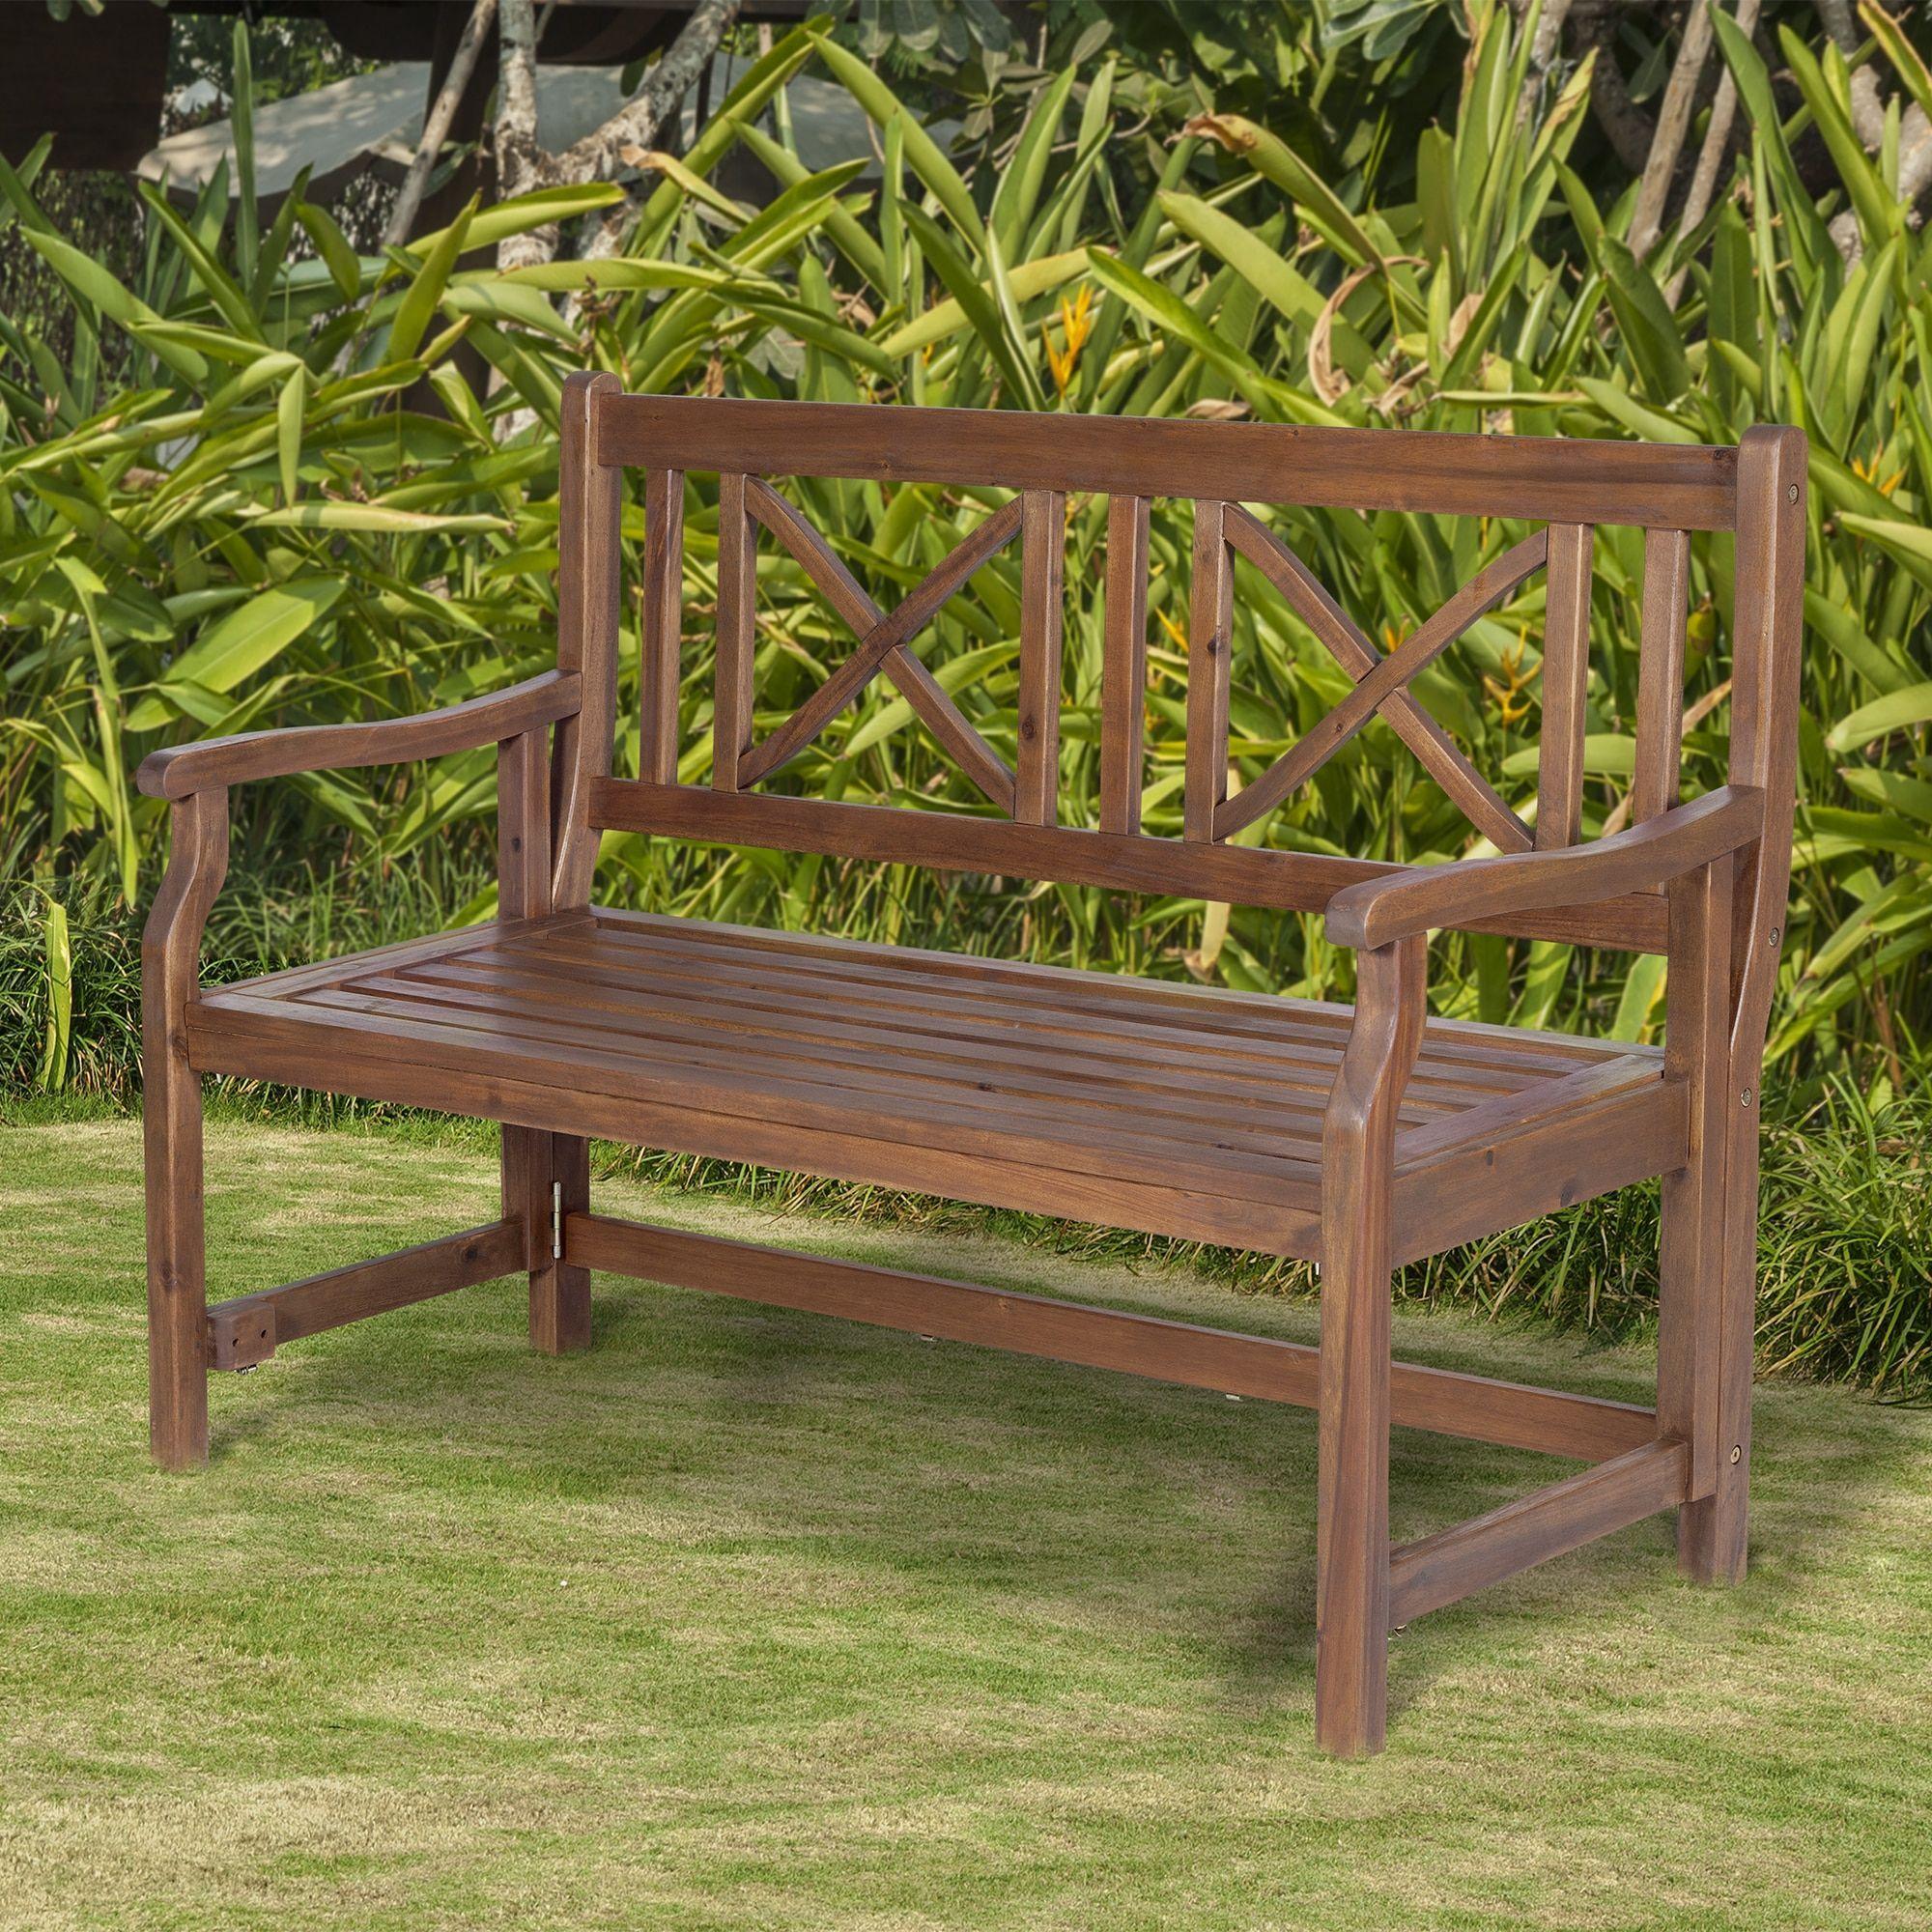 Super 48 Inch Dark Brown Acacia Wood Folding Patio Bench 48 Cjindustries Chair Design For Home Cjindustriesco